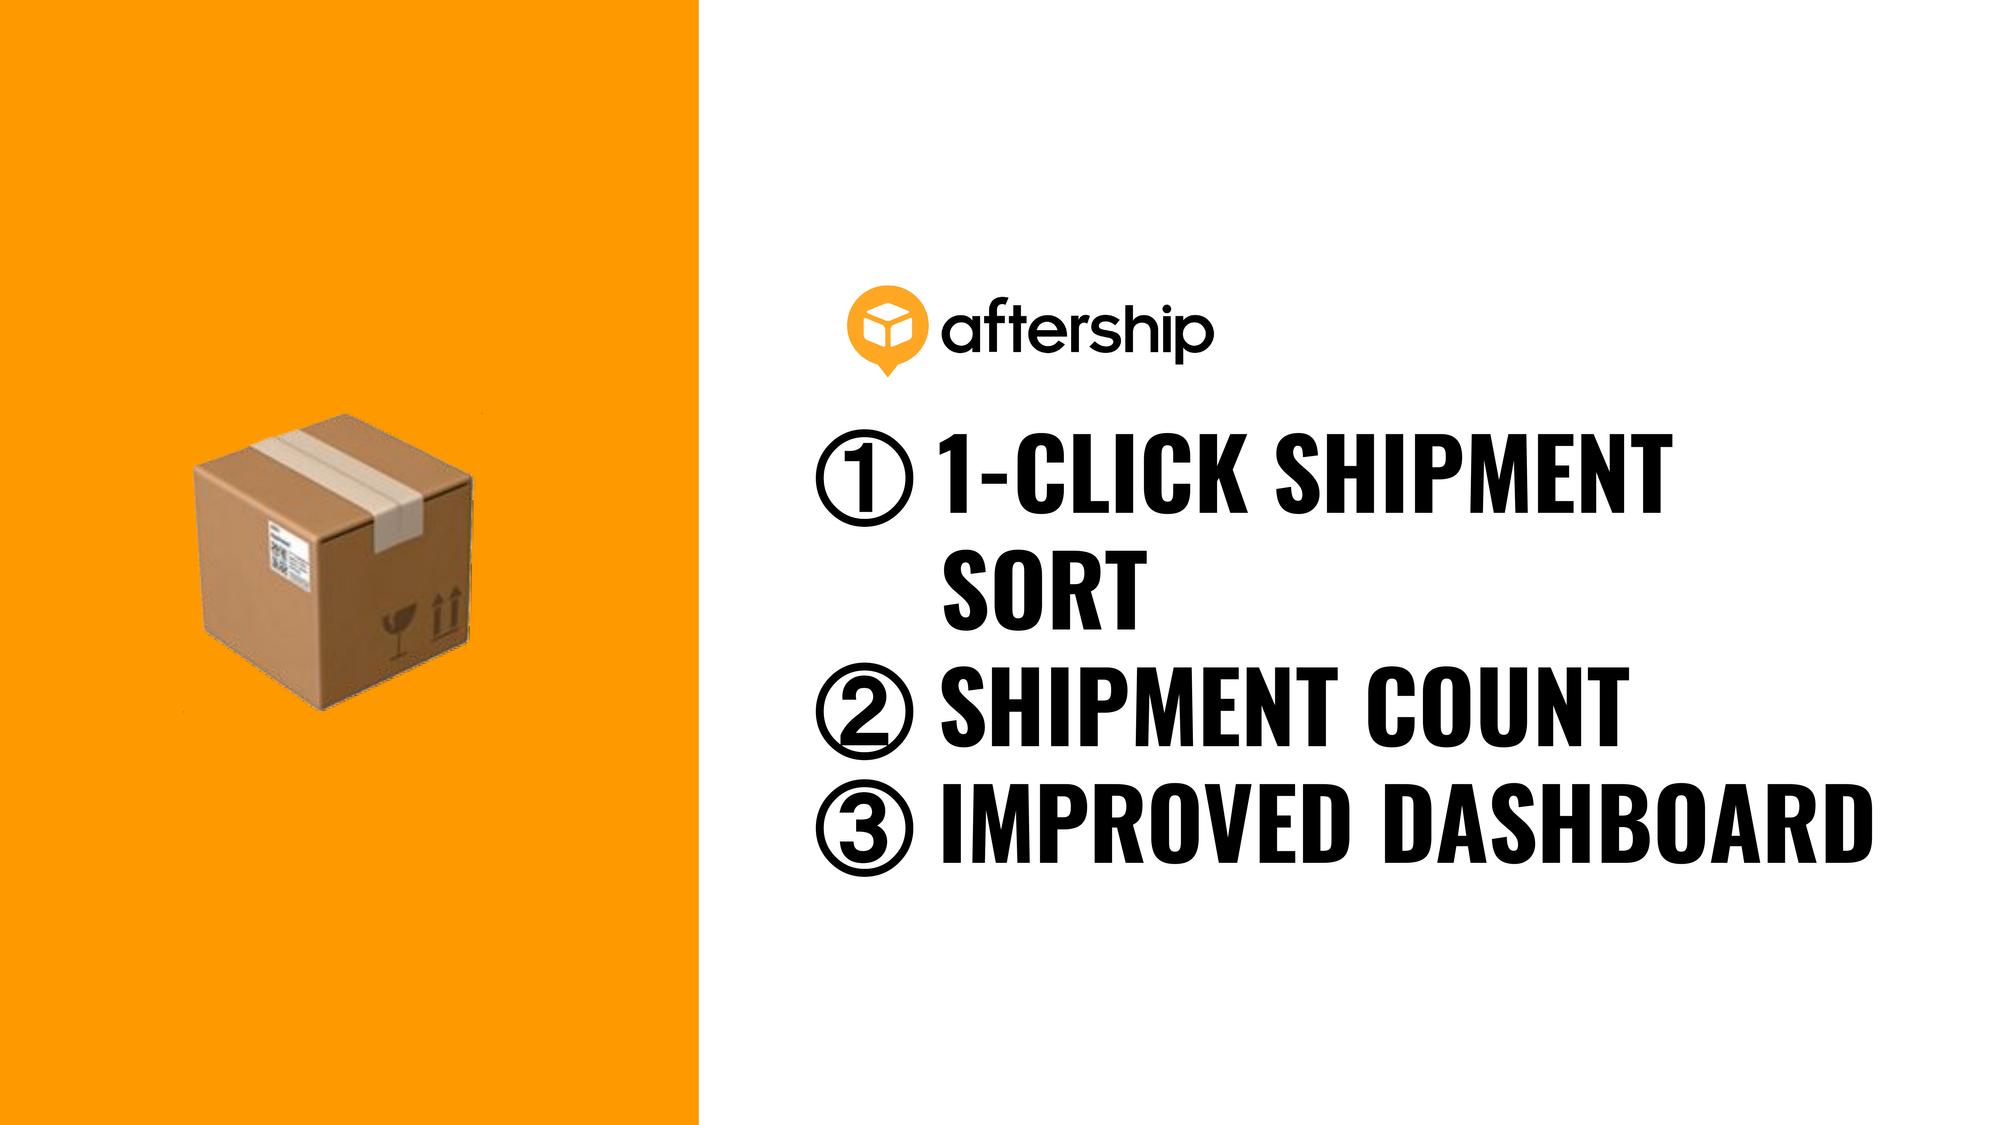 3 AfterShip updates for faster shipment management